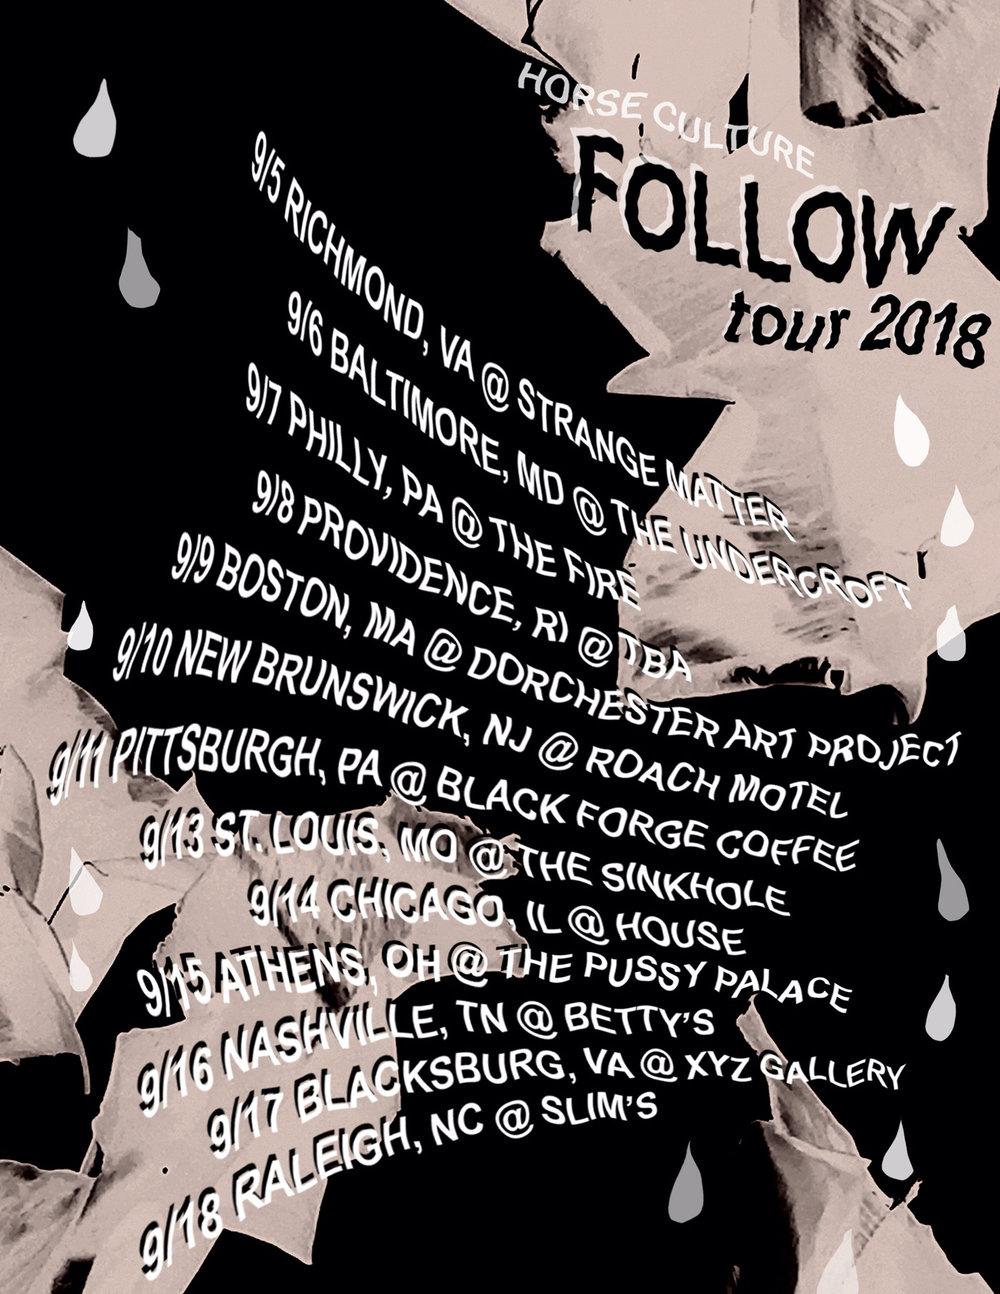 FH-059 Horse Culture 2018-Tour_1400.jpg